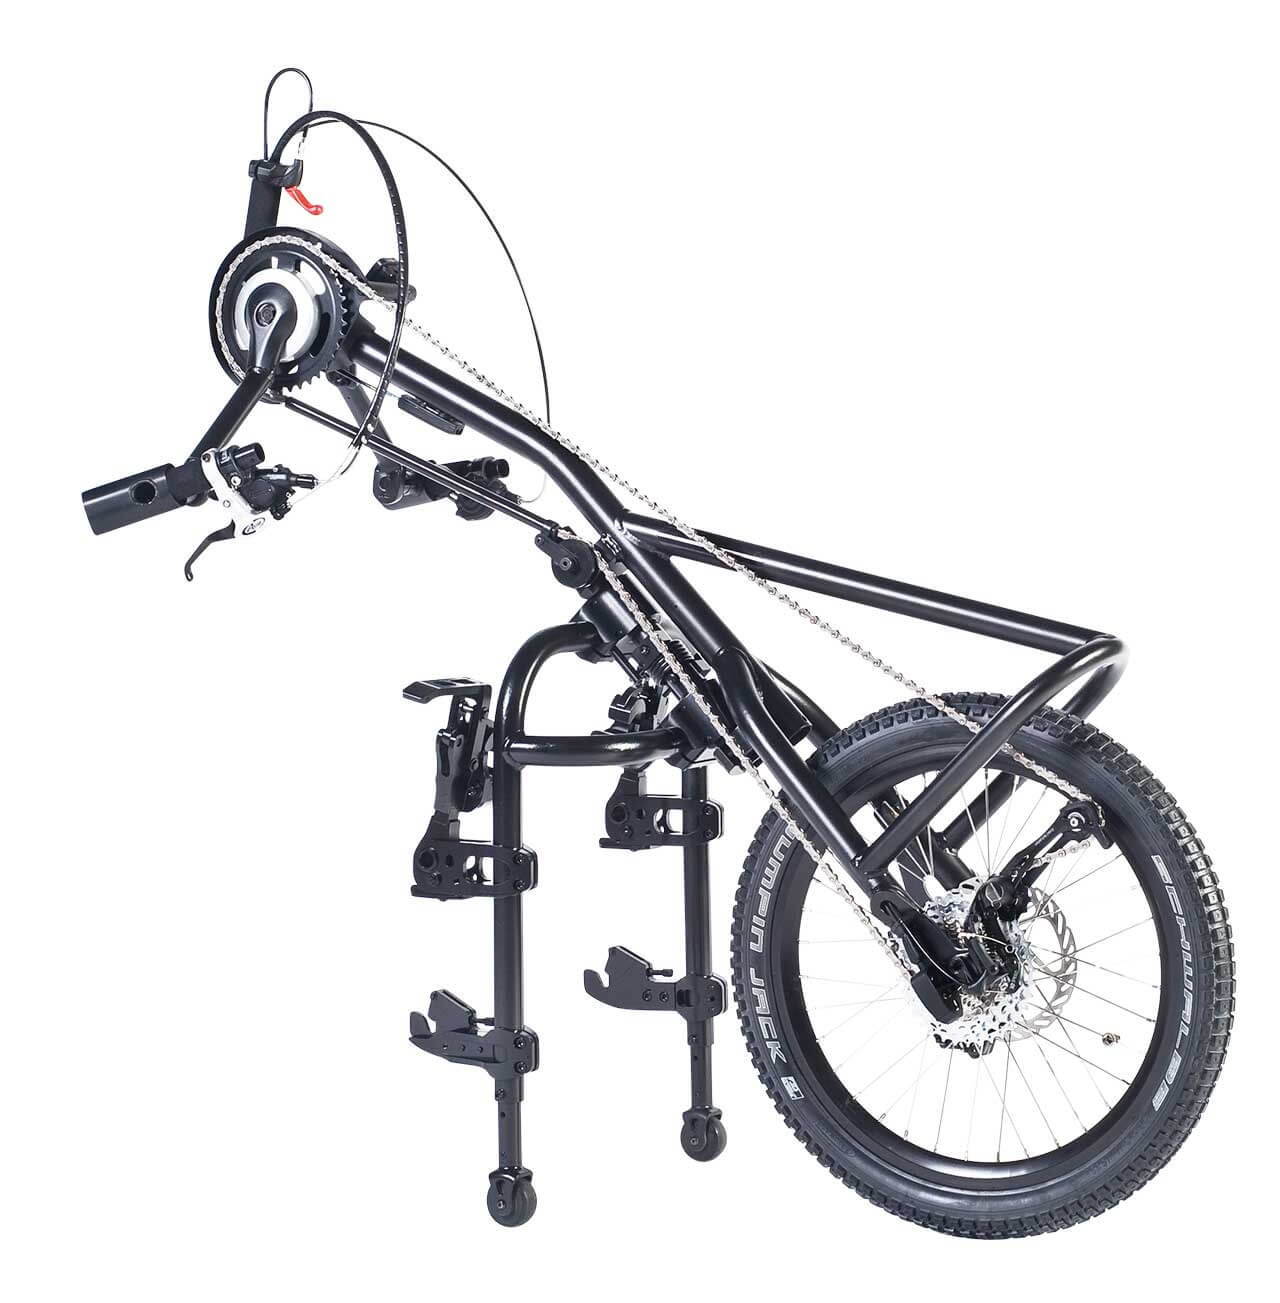 Sunrise Attitude Wheelchair Handbike for hire or sale